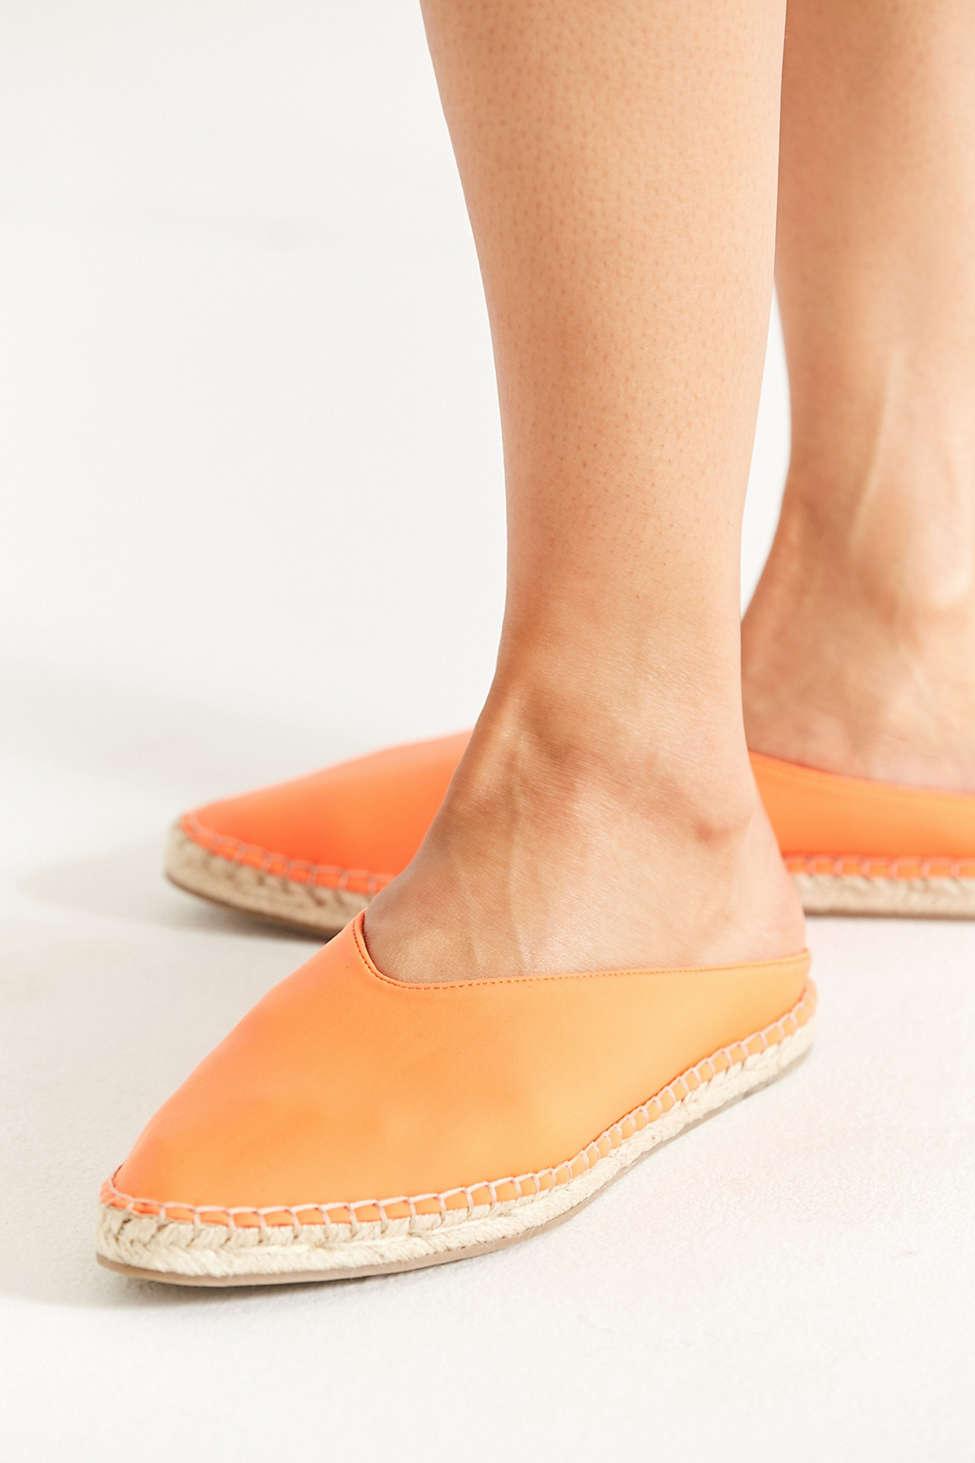 UO Neoprene Espadrille Slip-On Flat